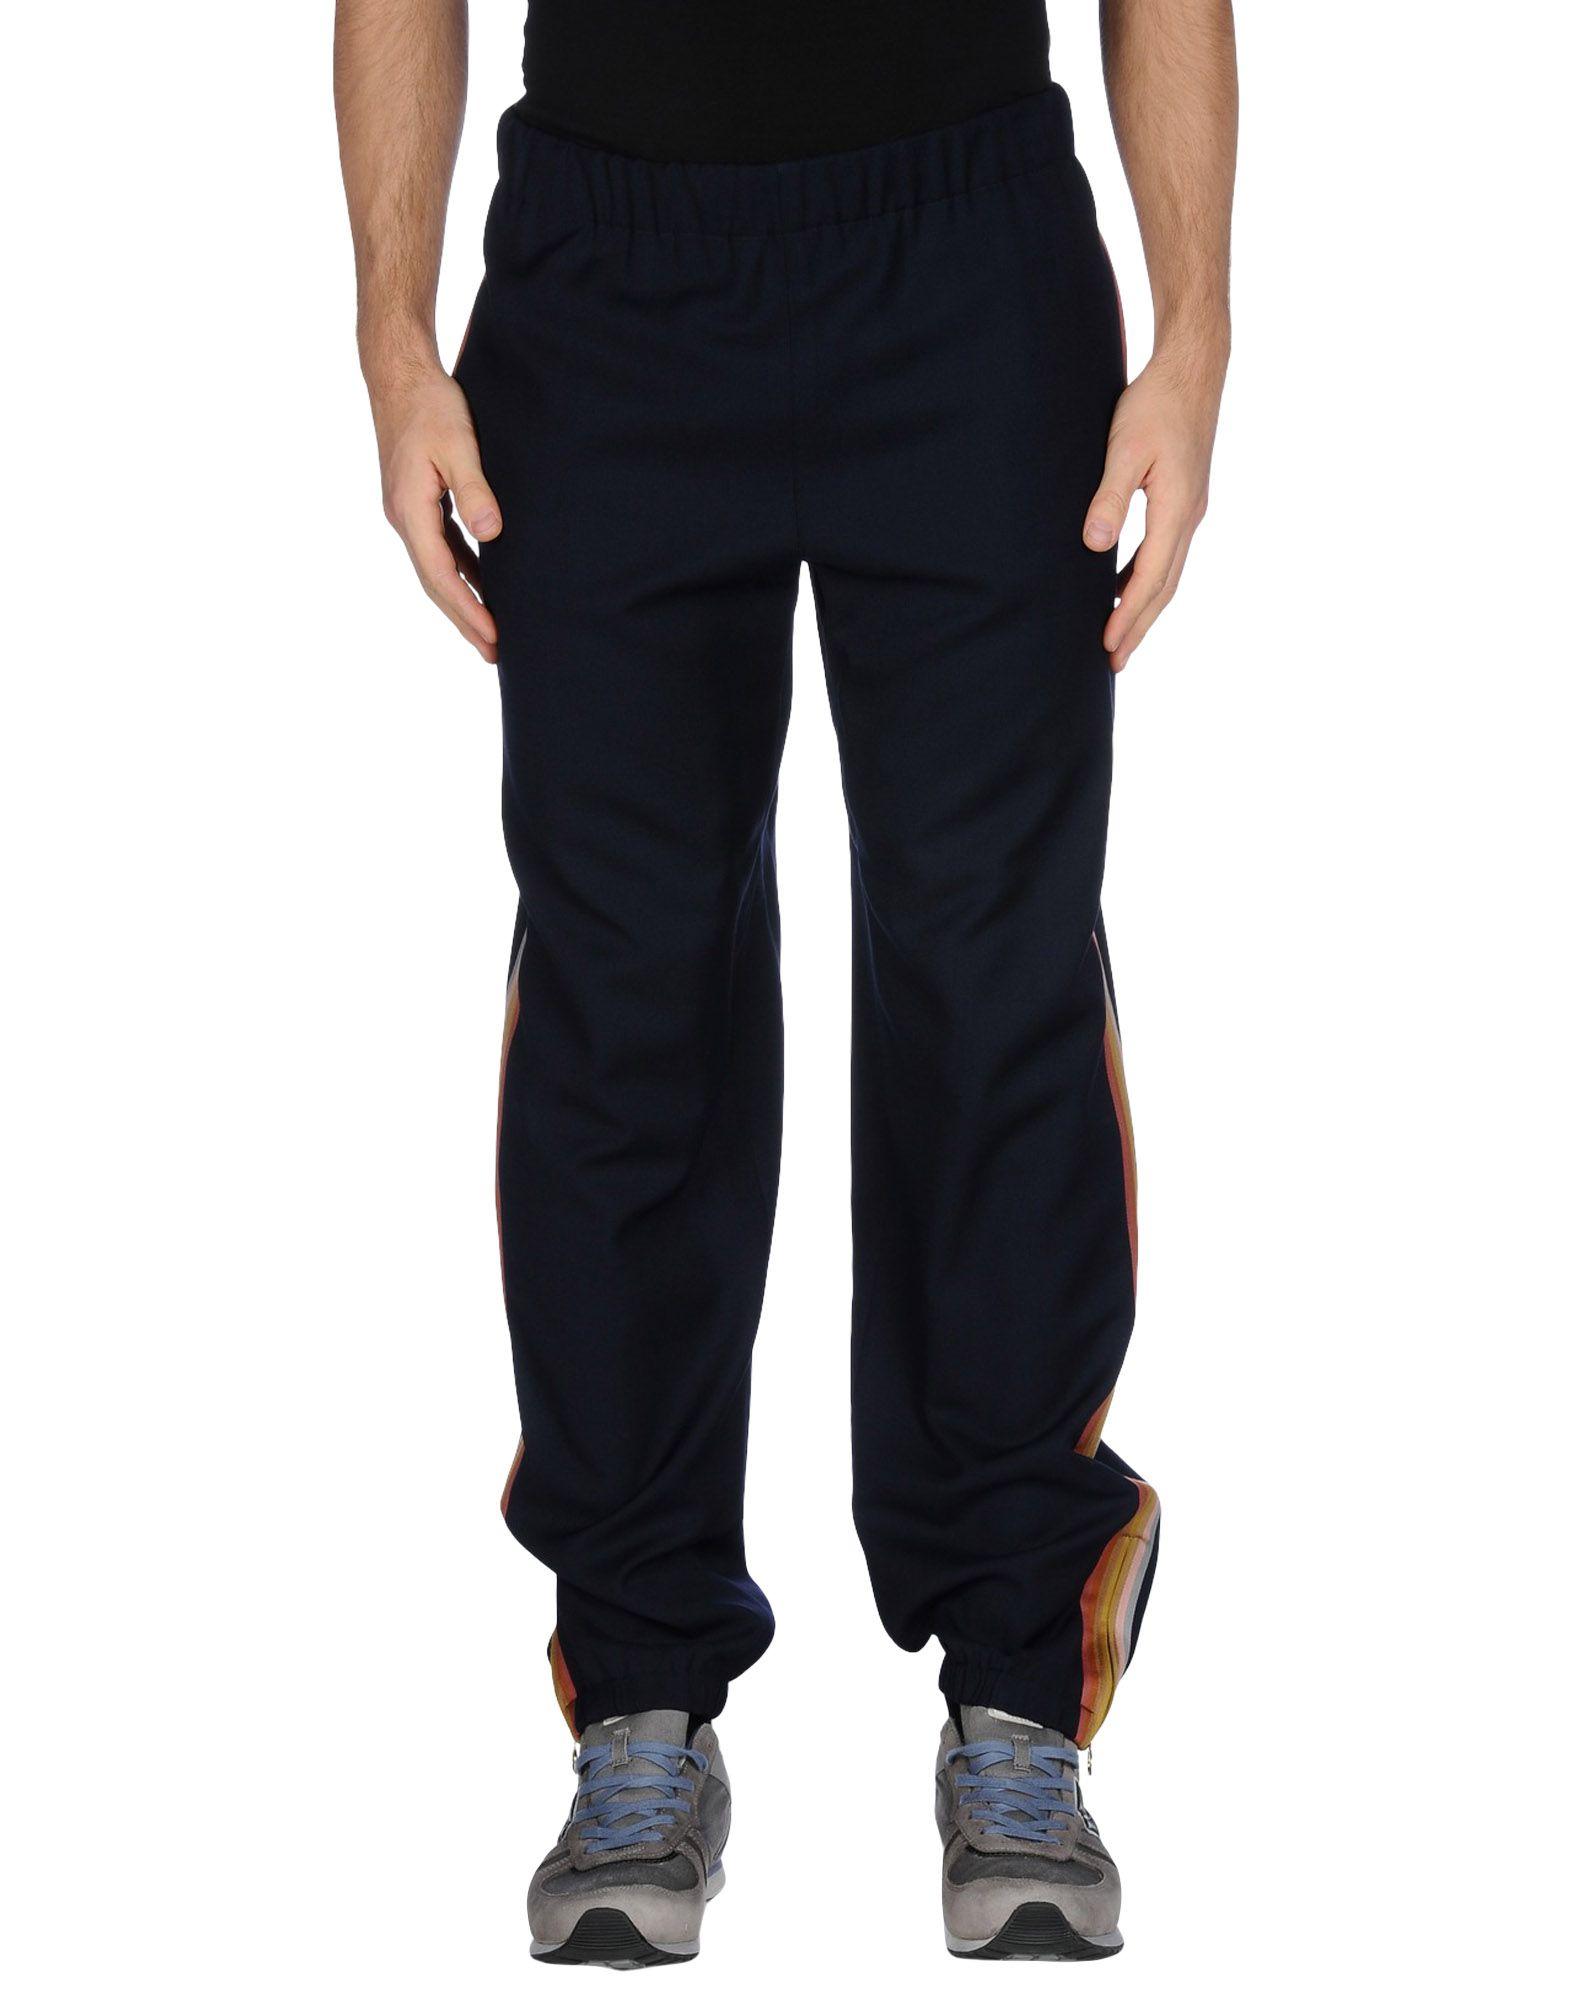 Pantalone Paul Smith Uomo - Acquista online su